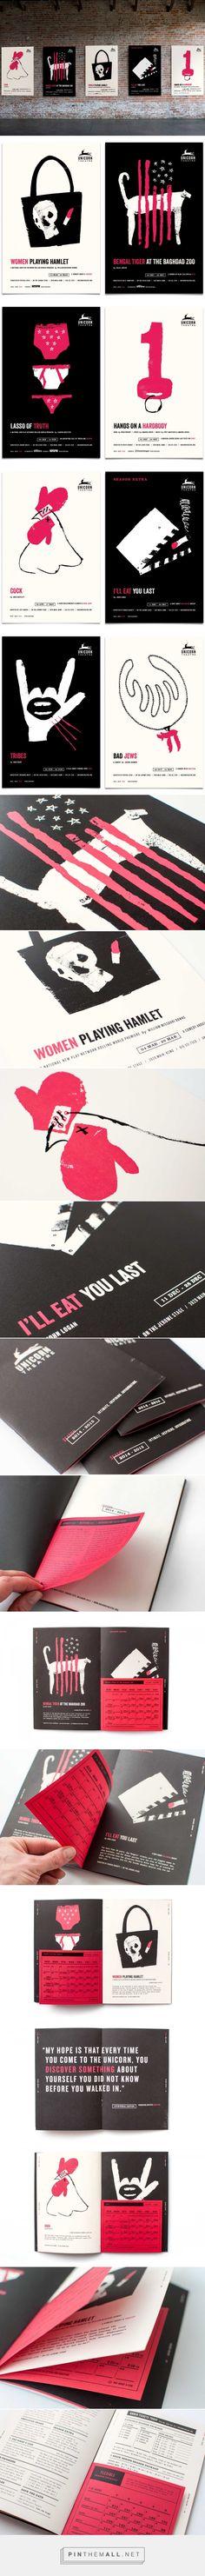 Unicorn Theatre Branding by Design Ranch | Fivestar Branding – Design and Branding Agency & Inspiration Gallery